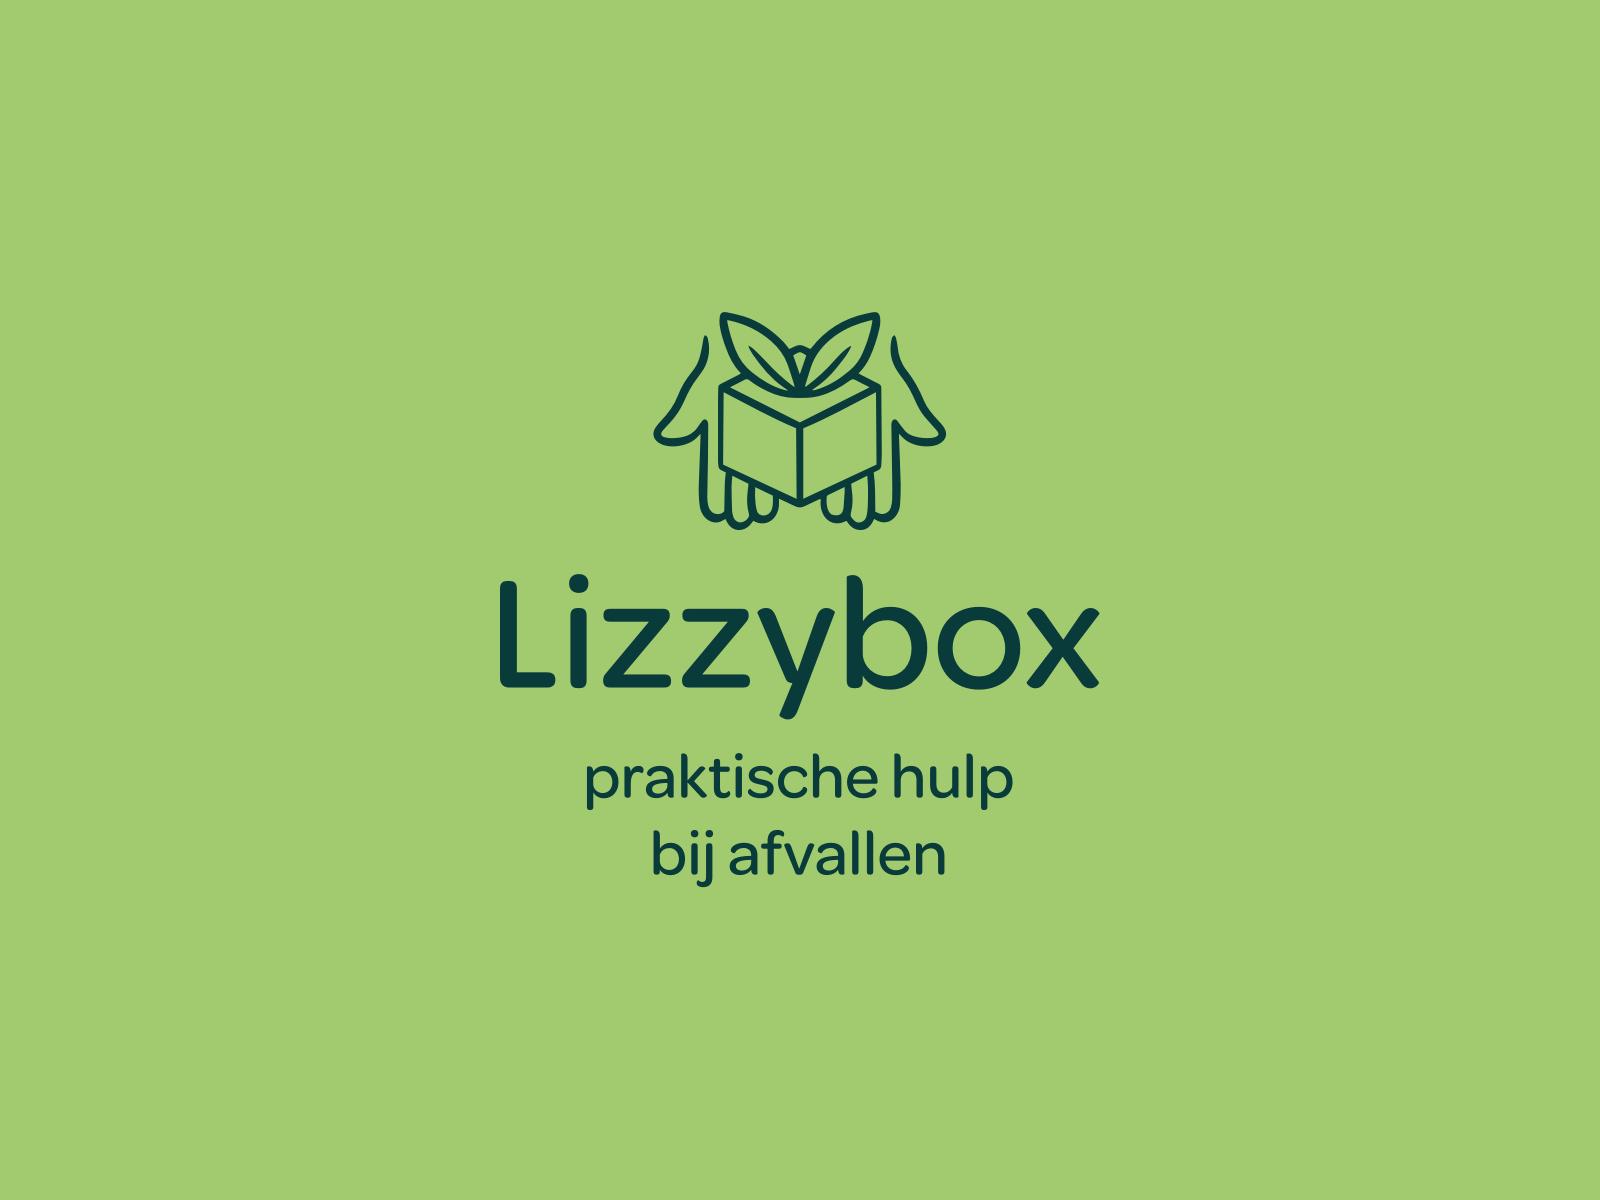 Lizzybox Branding: The Logo